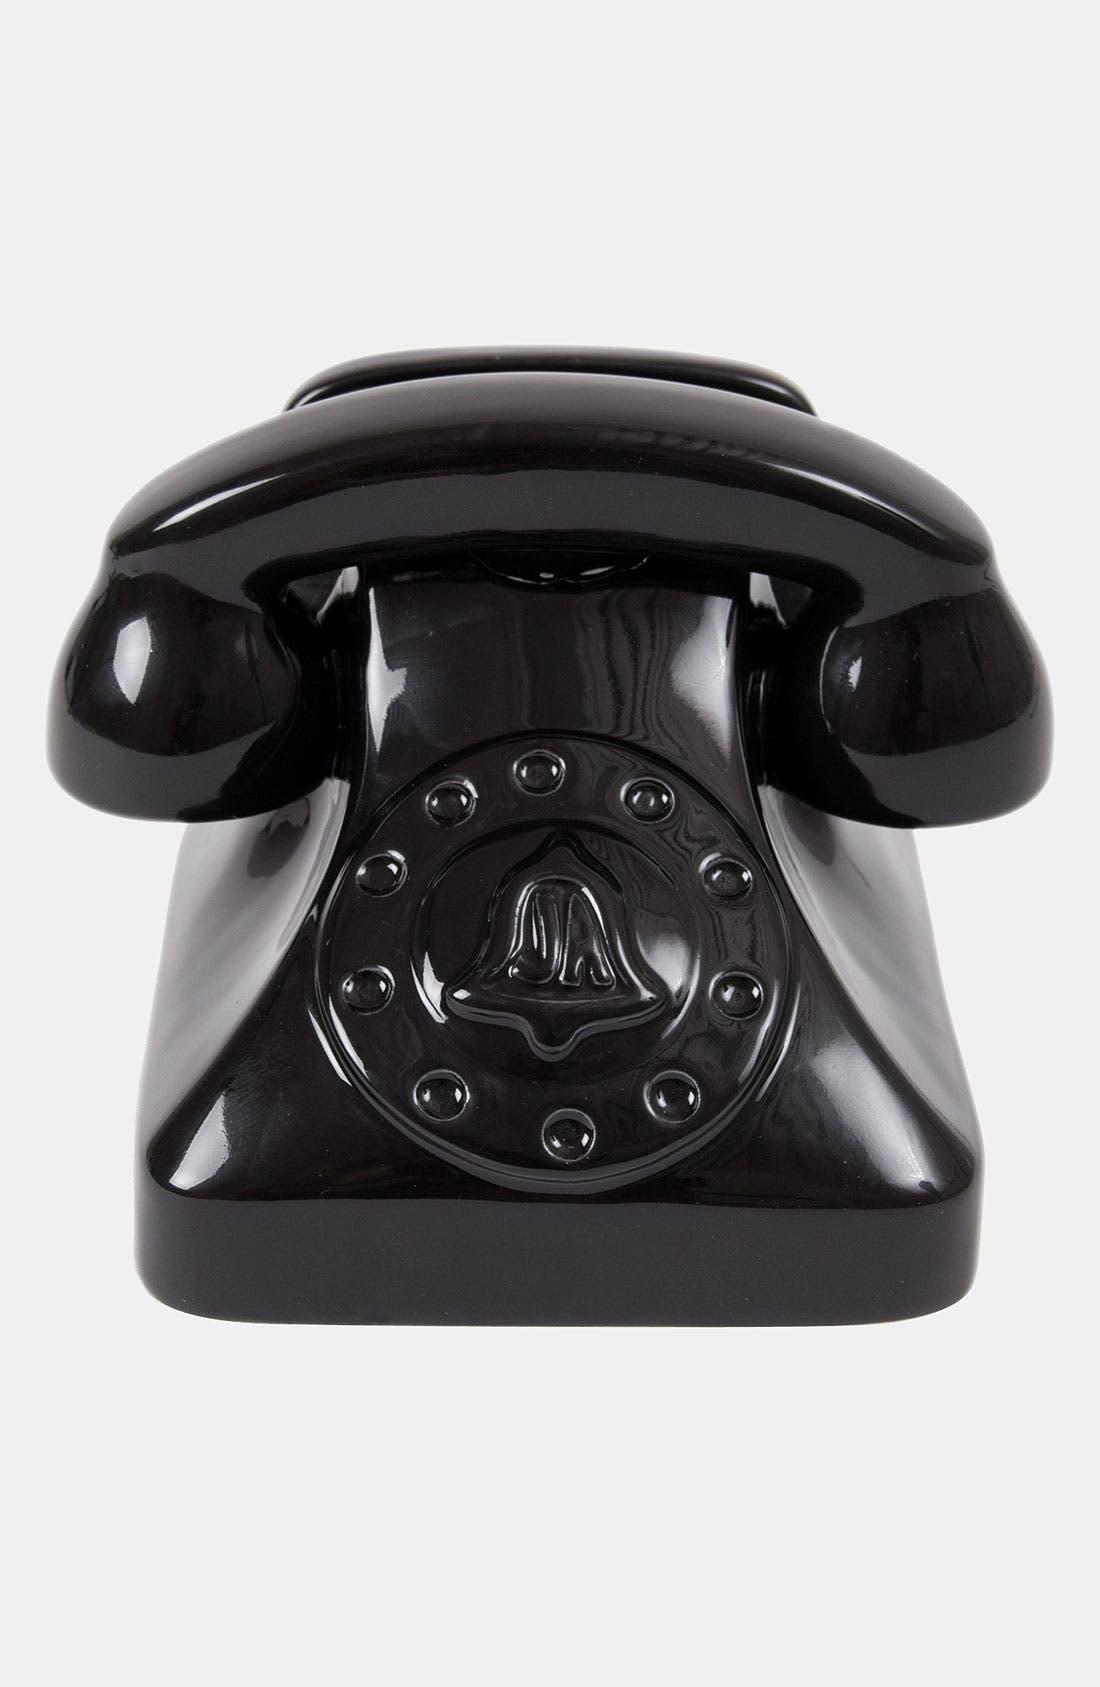 Main Image - Jonathan Adler Universal Smart Phone Dock (Nordstrom Exclusive)